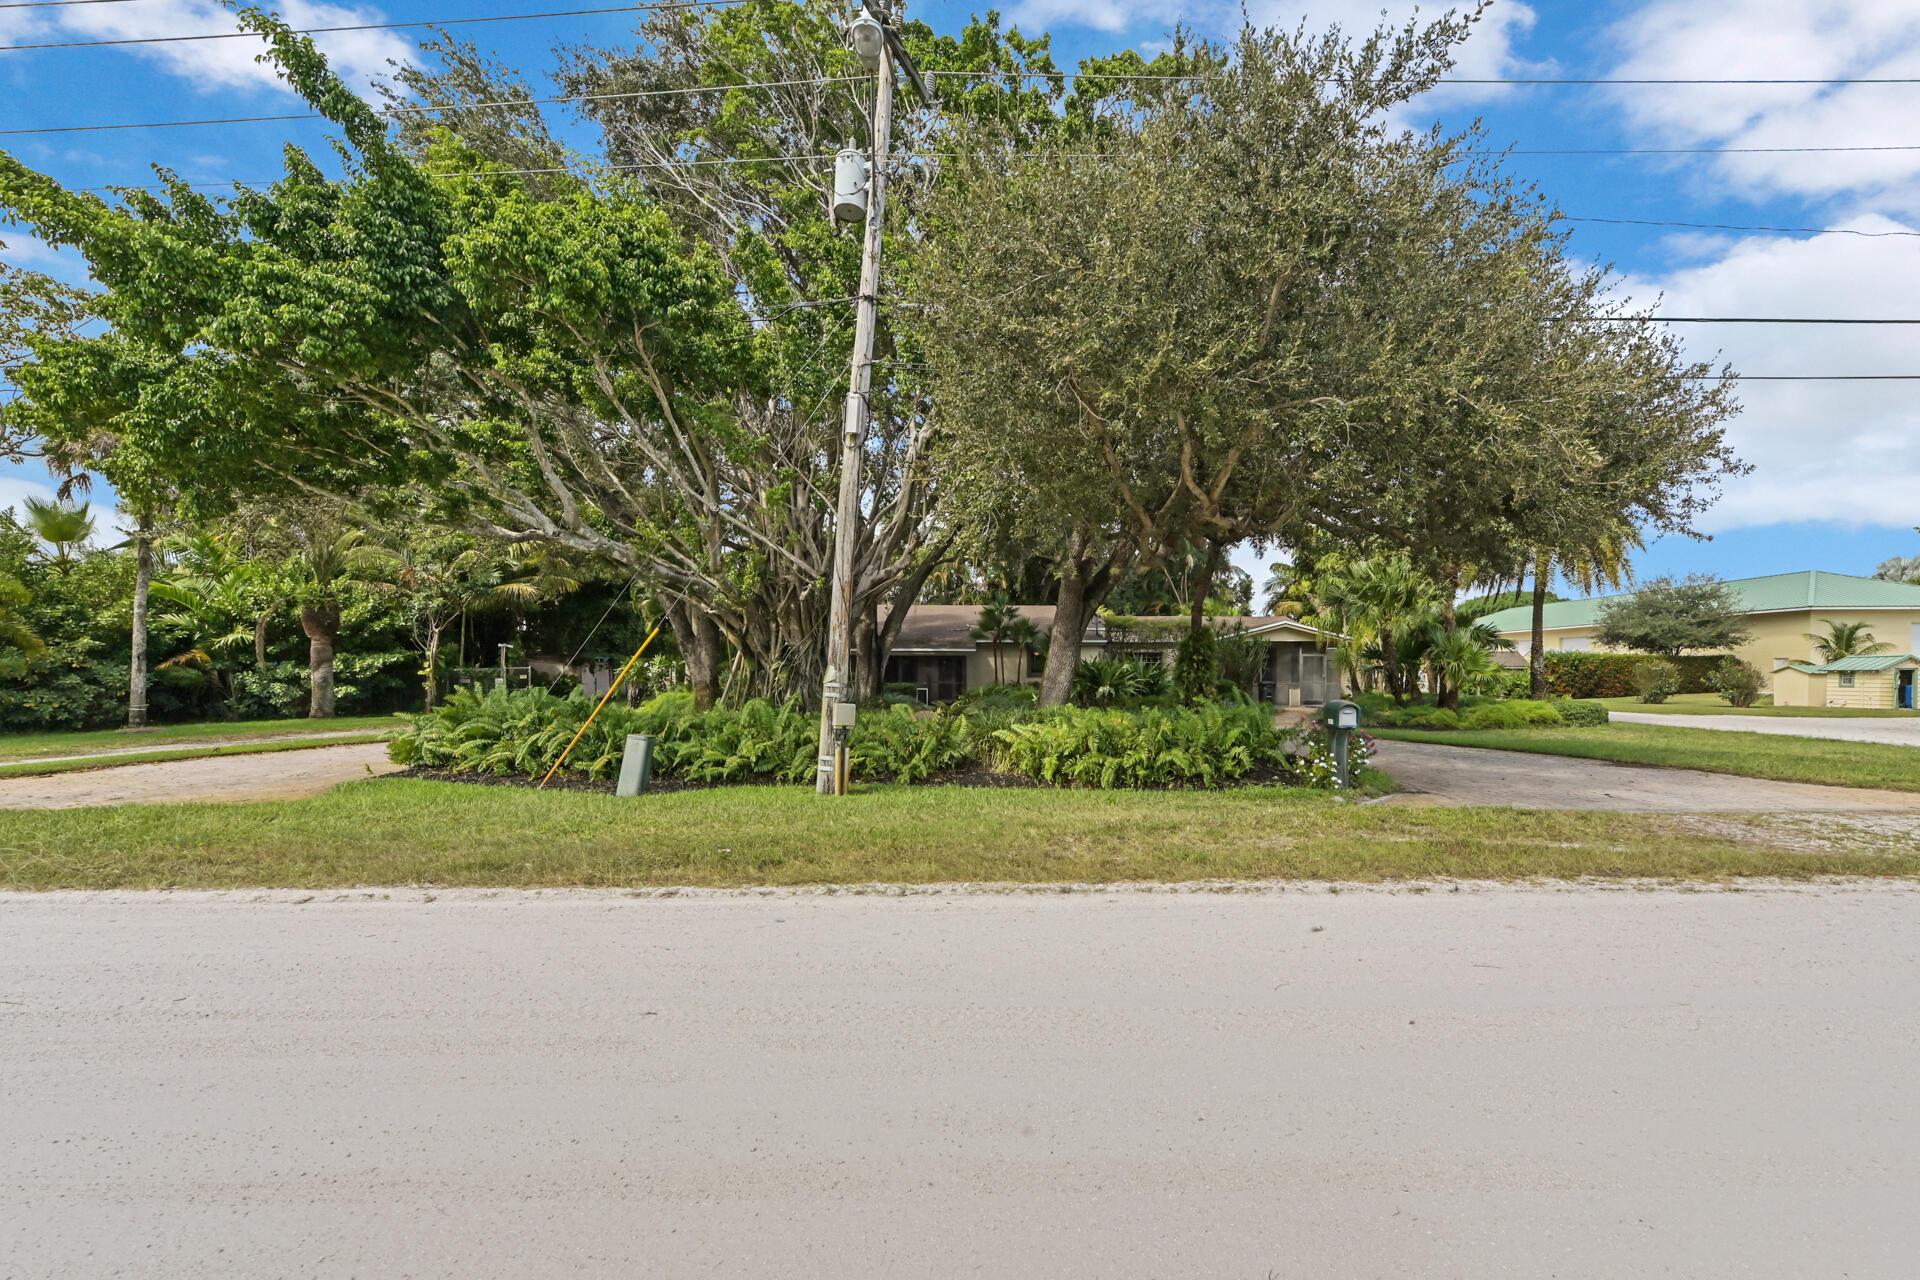 4919 Ridgewood Unit , Boynton Beach, Florida 33436